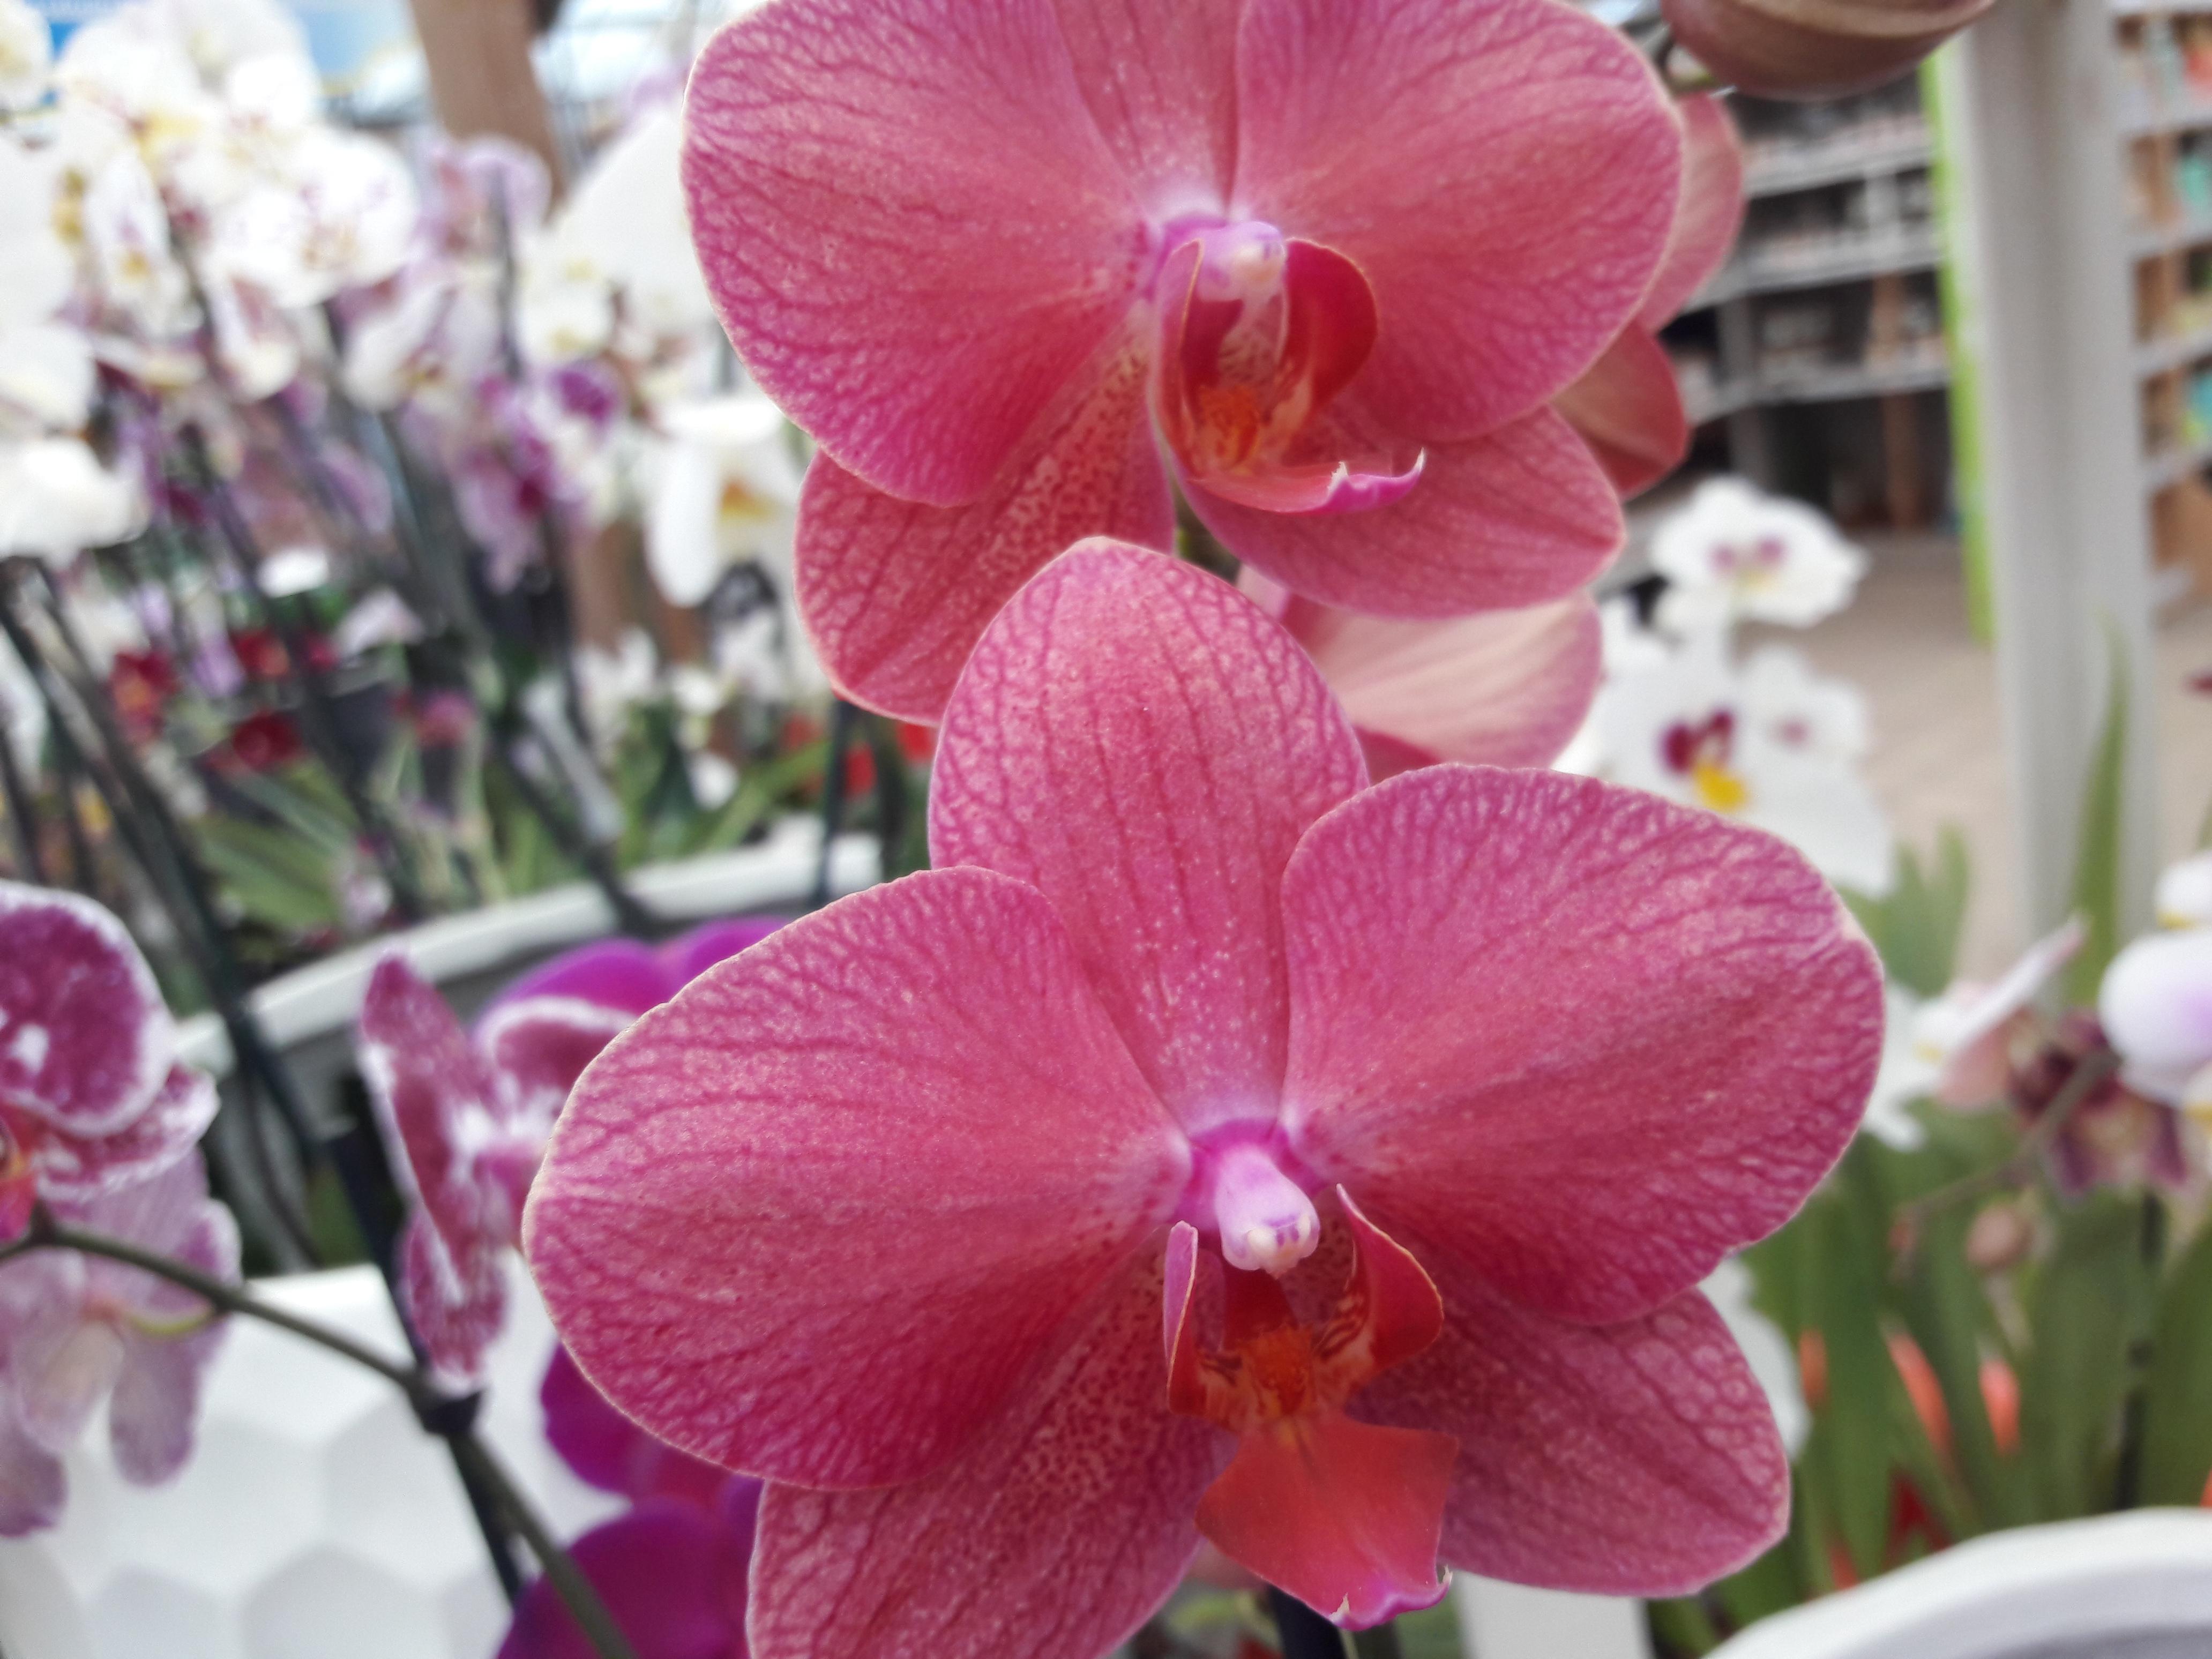 orchiées - phalaenopsis